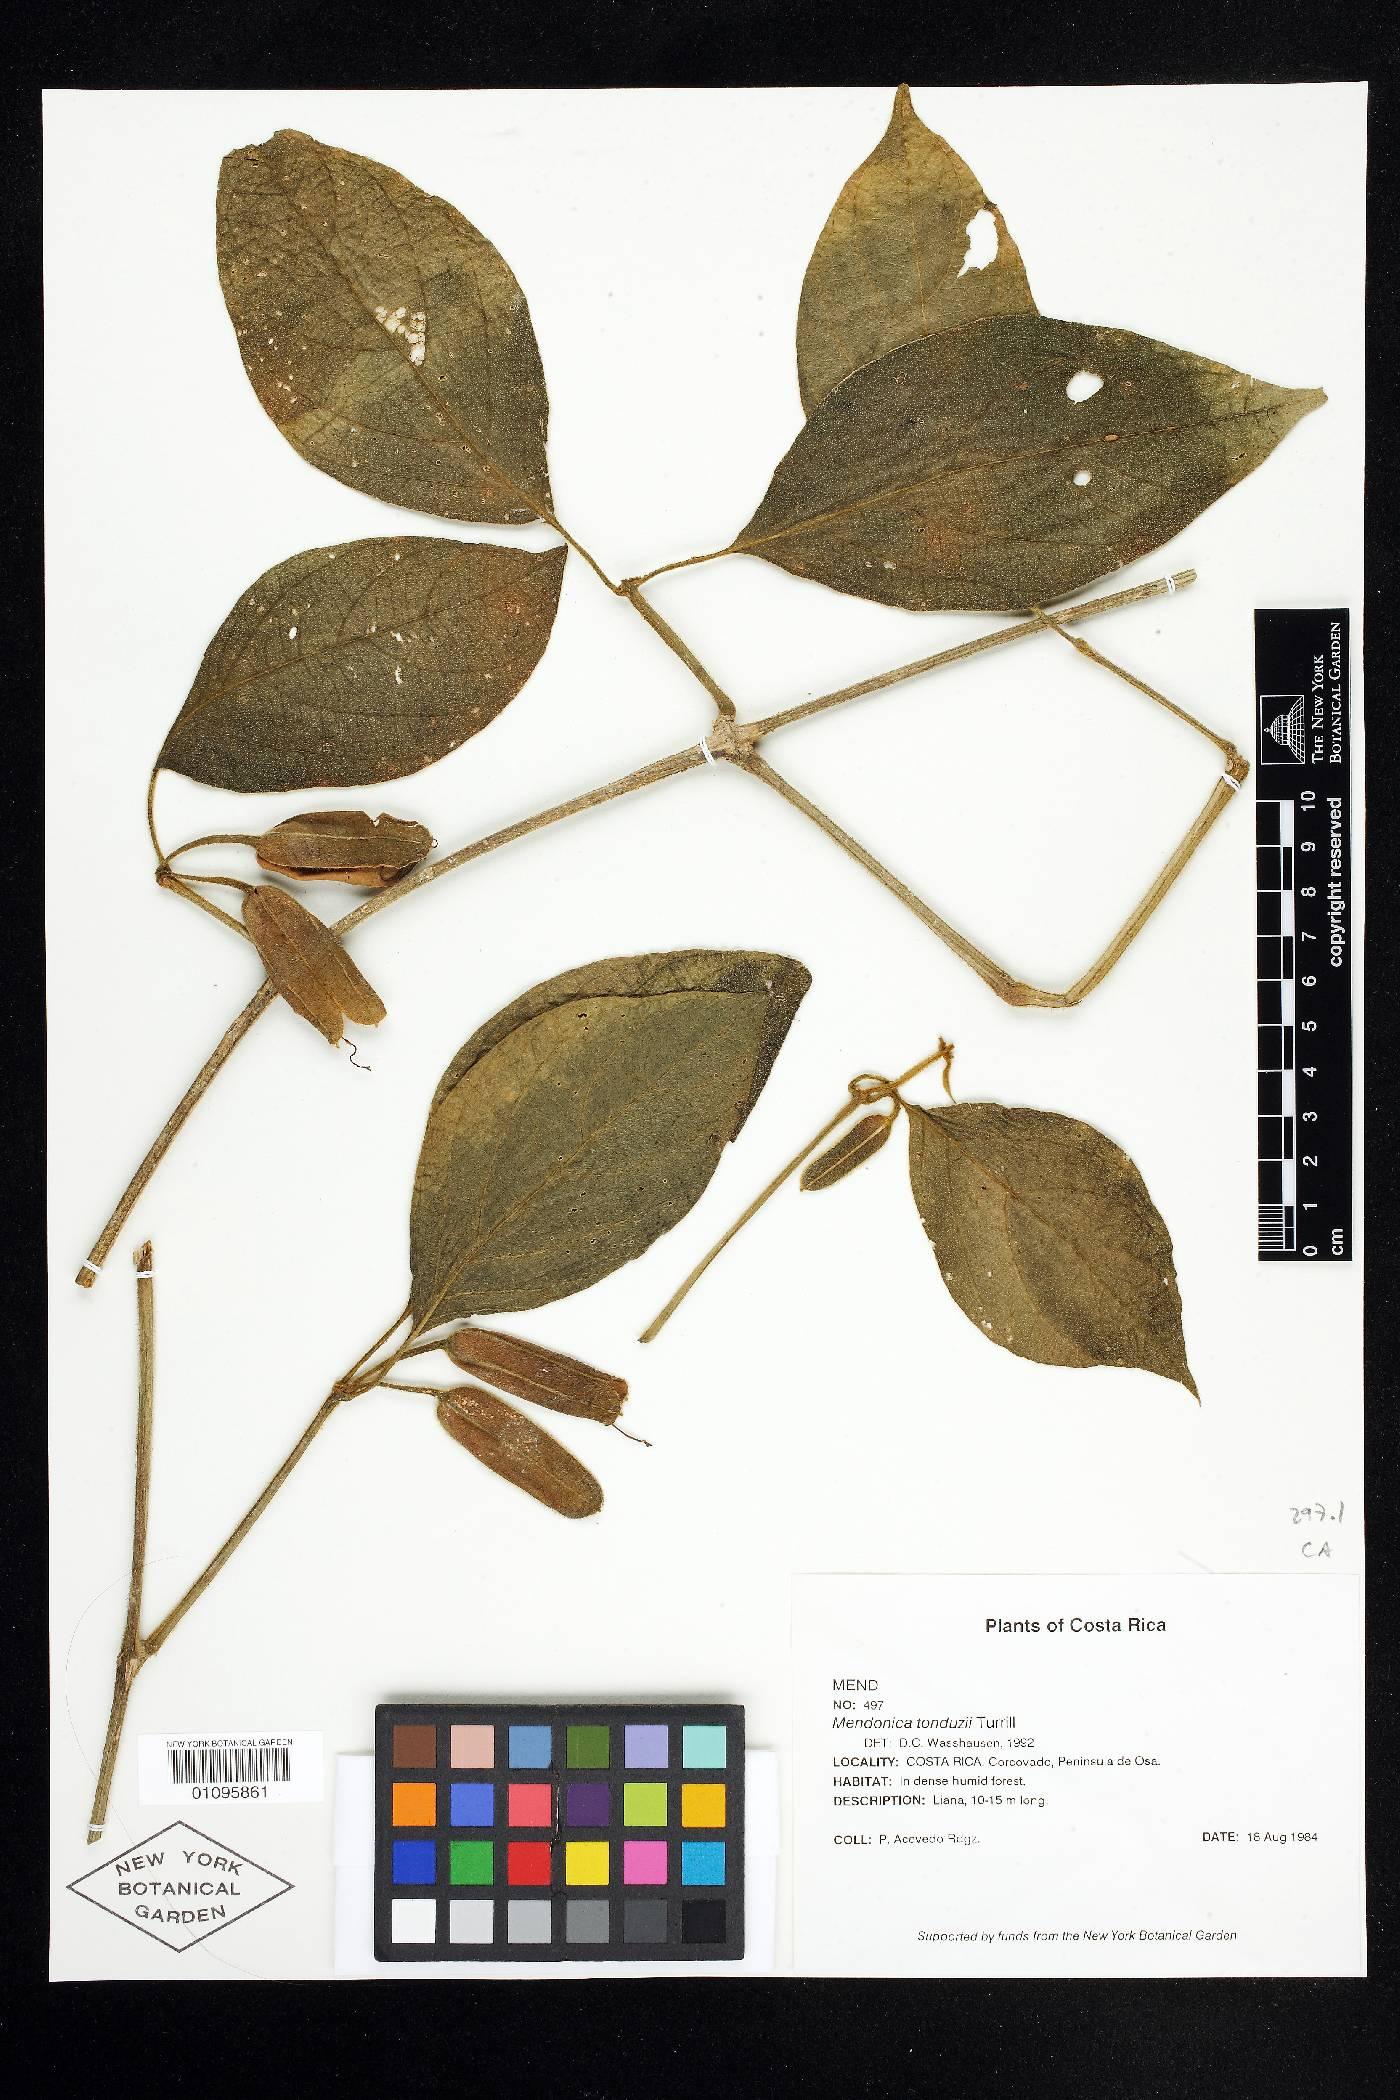 Mendoncia tonduzii image